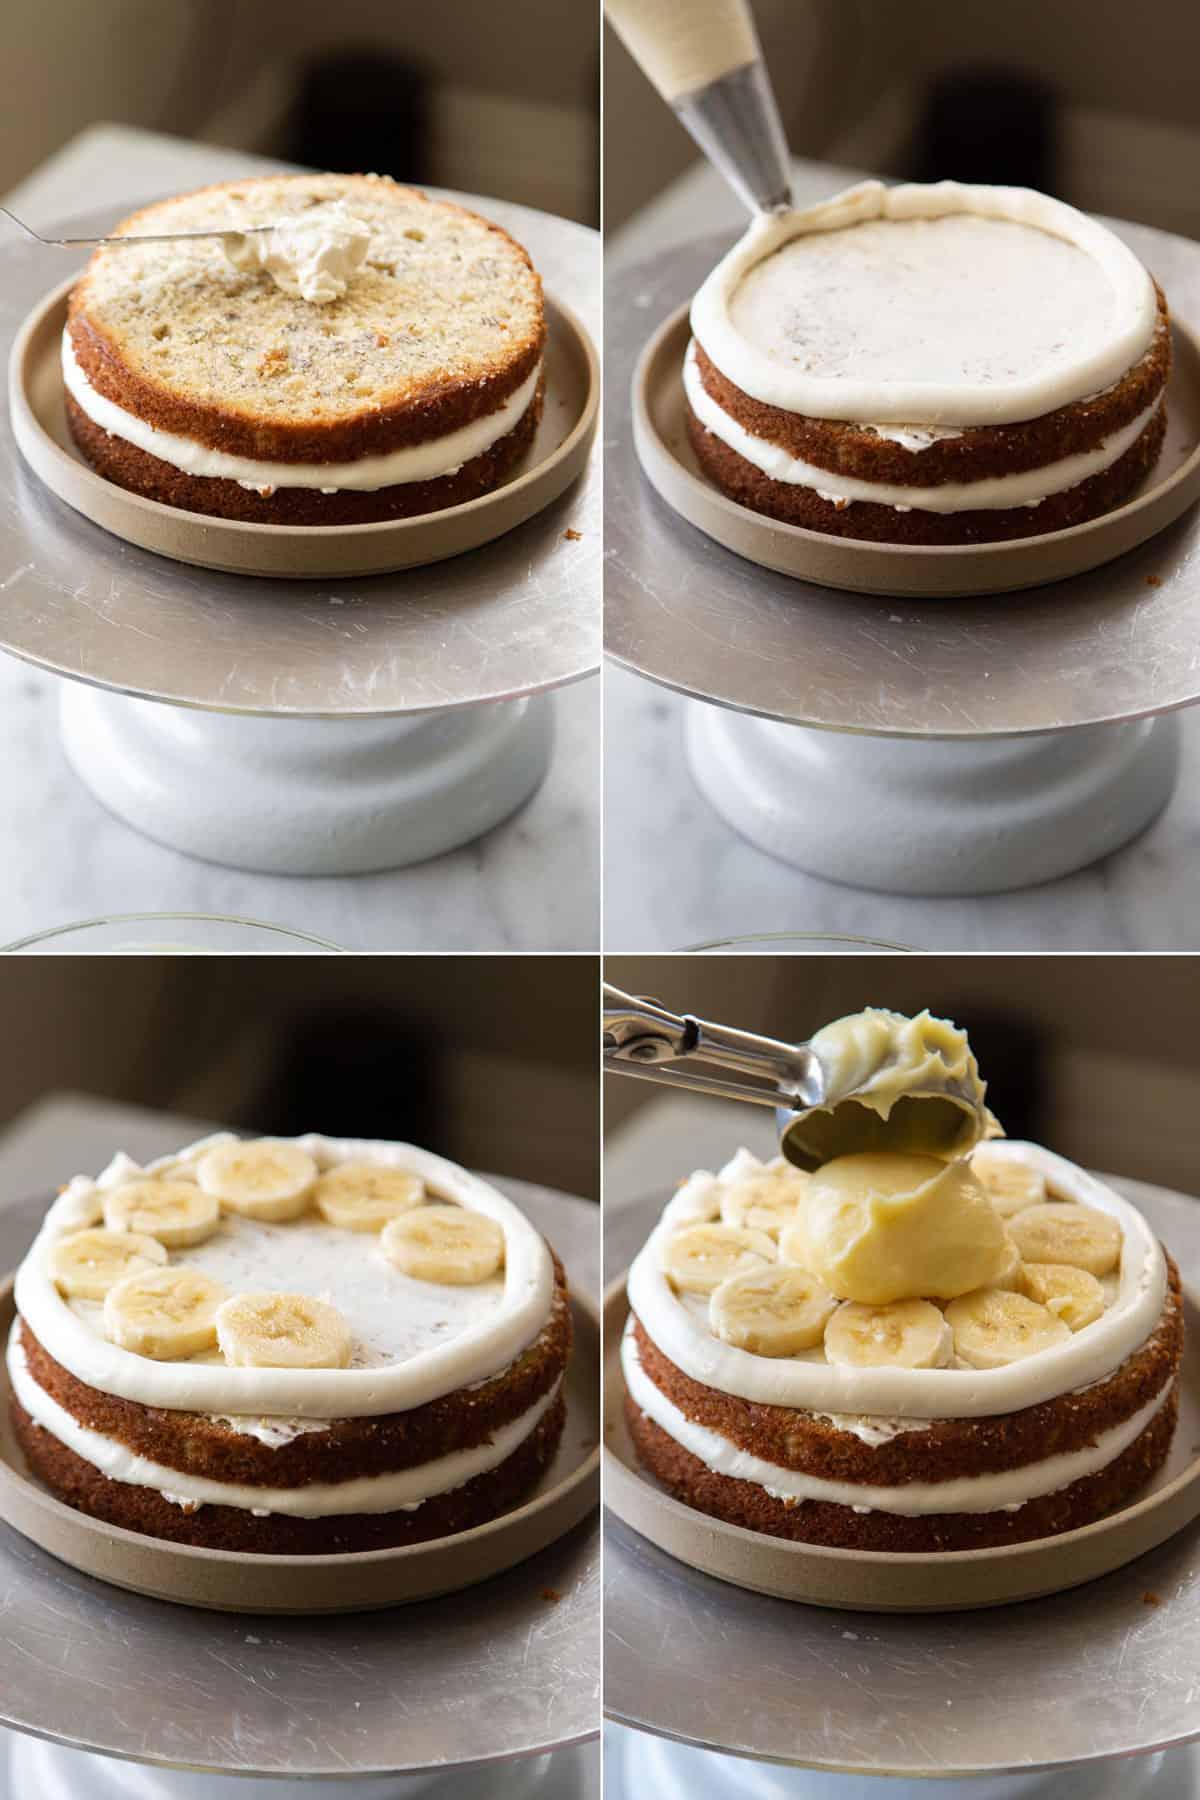 how to build banana cream cake